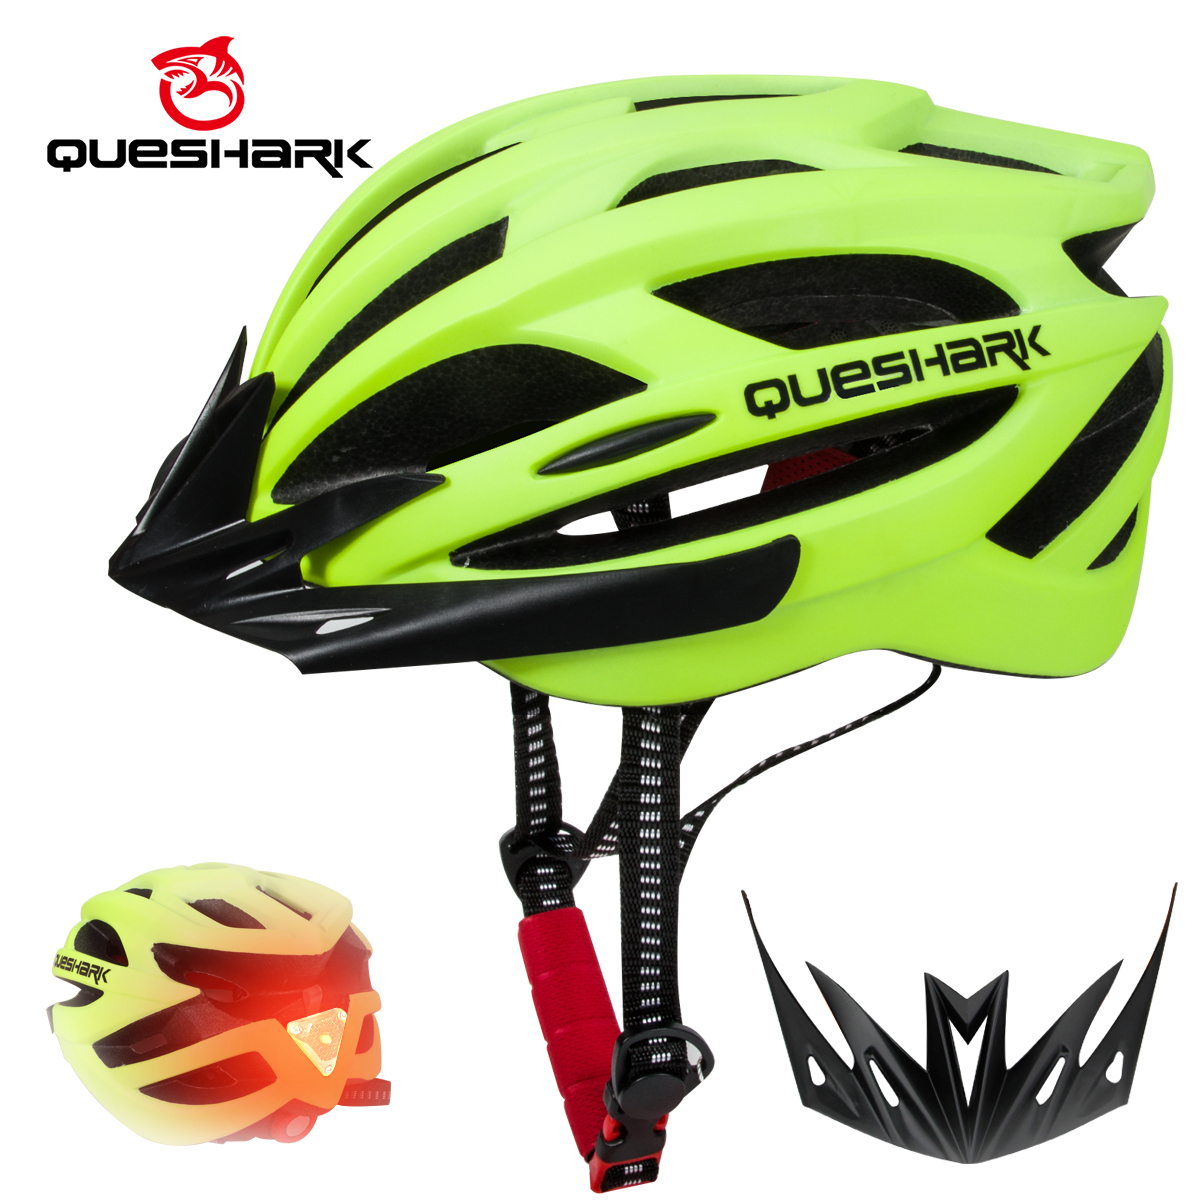 QUESHARK Professional Men Women Cycling Helmet With Taillight Ultralight MTB Bicycle Helmet LED Light M Size 56cm-62cm QE123